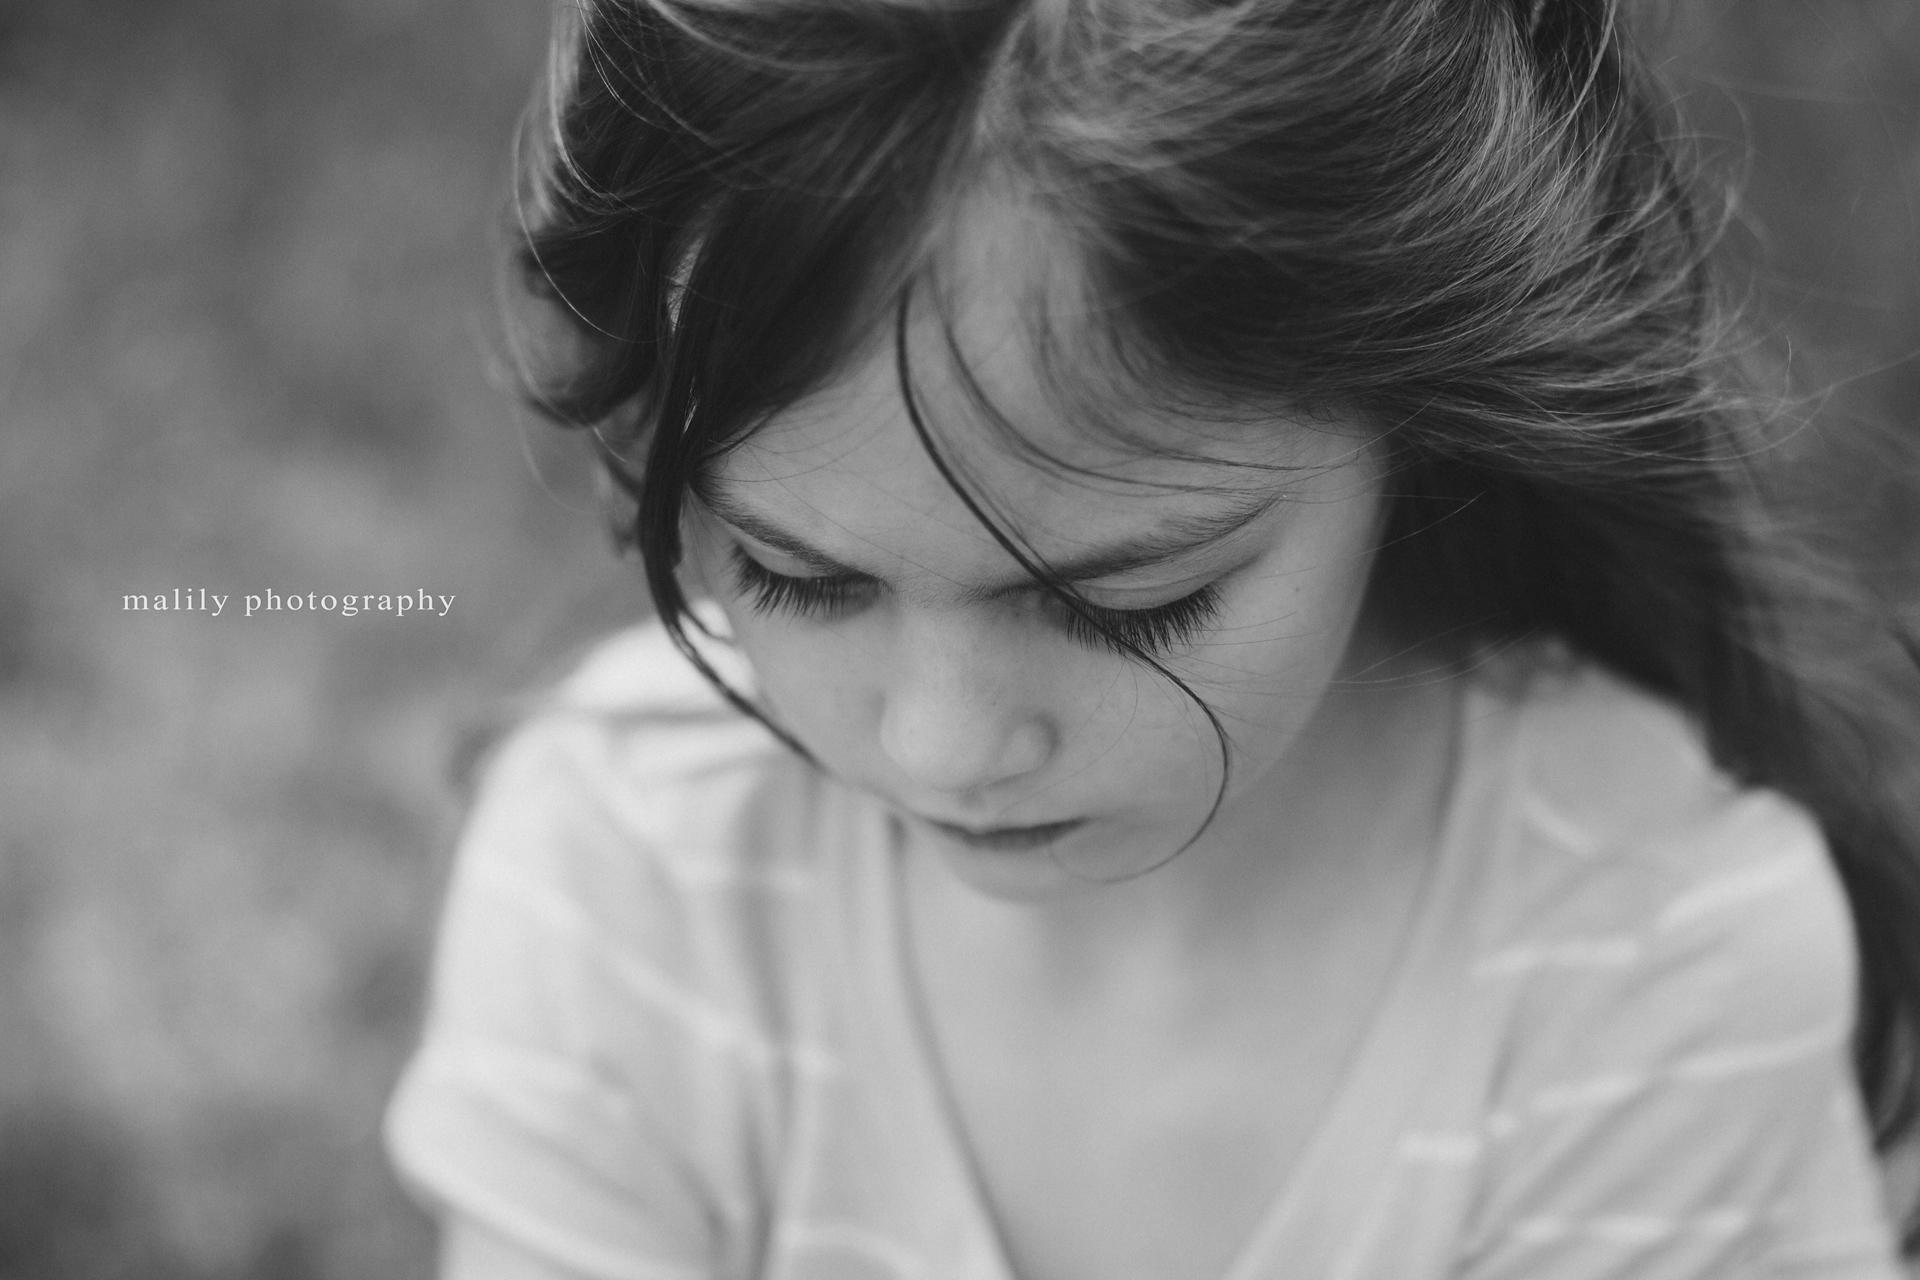 malily photography